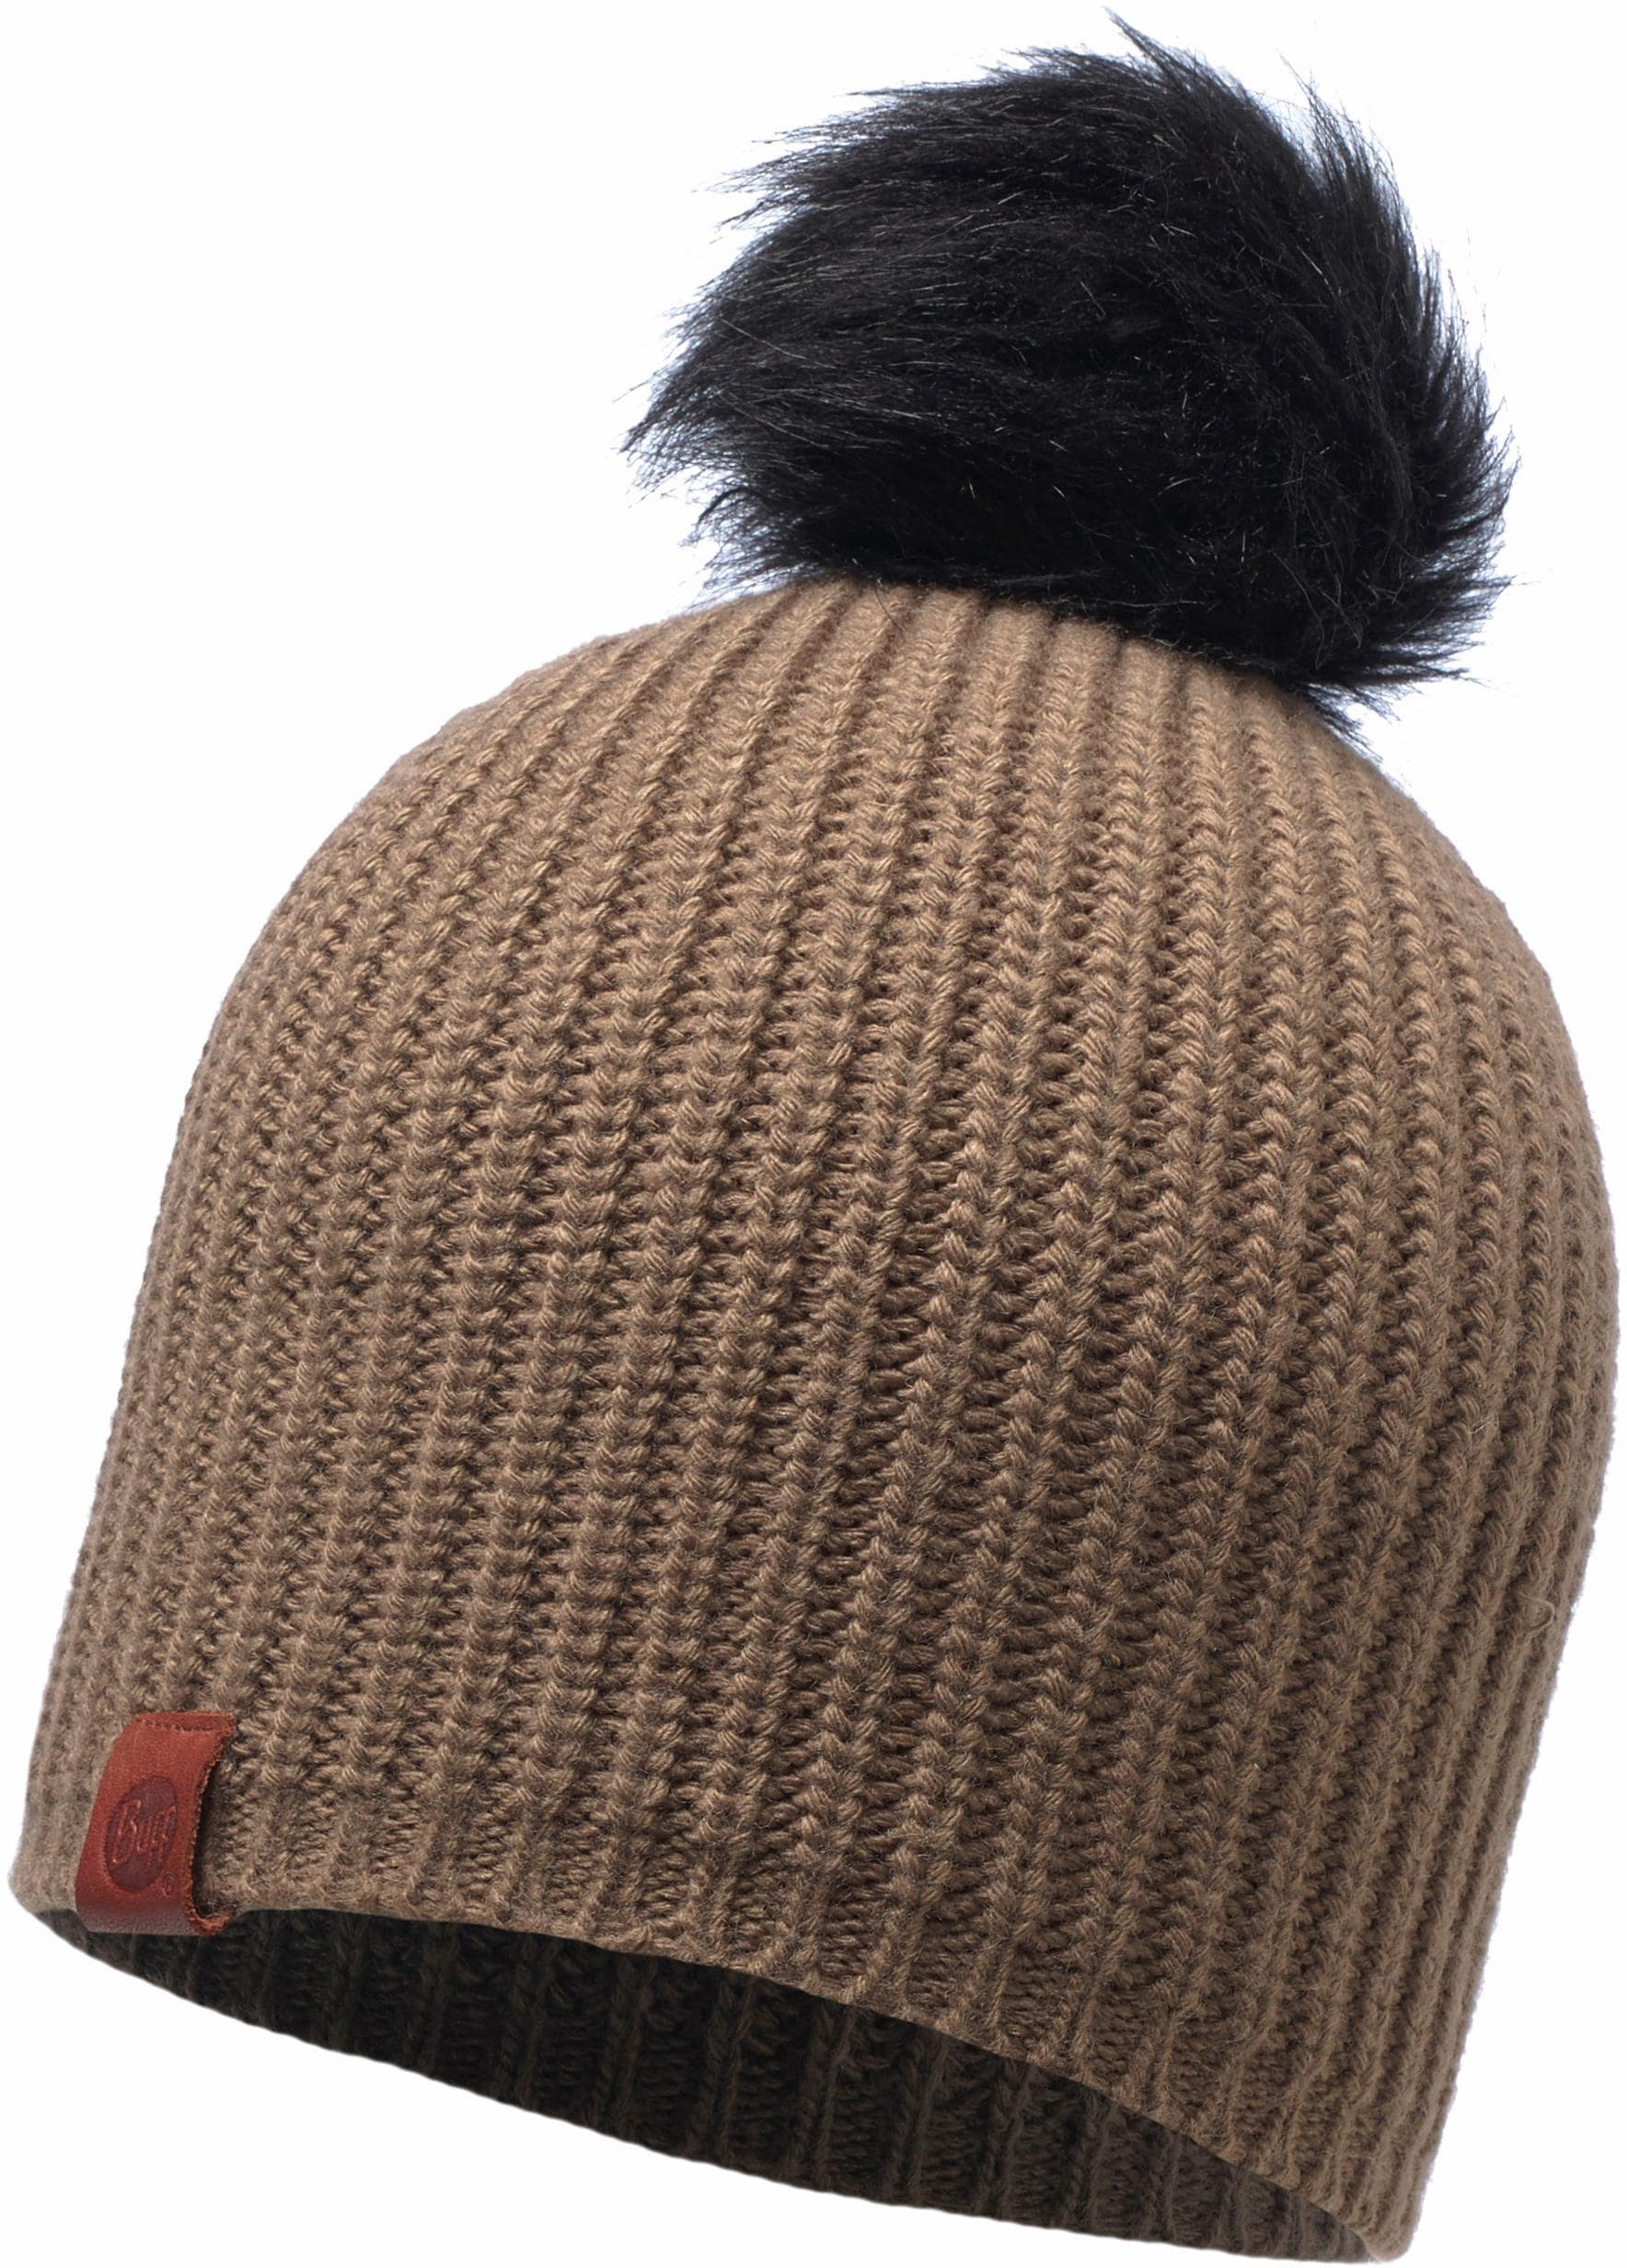 Buff Strickmütze Knitted Hat Buff Damenmode/Schmuck & Accessoires/Accessoires/Mützen/Strickmützen